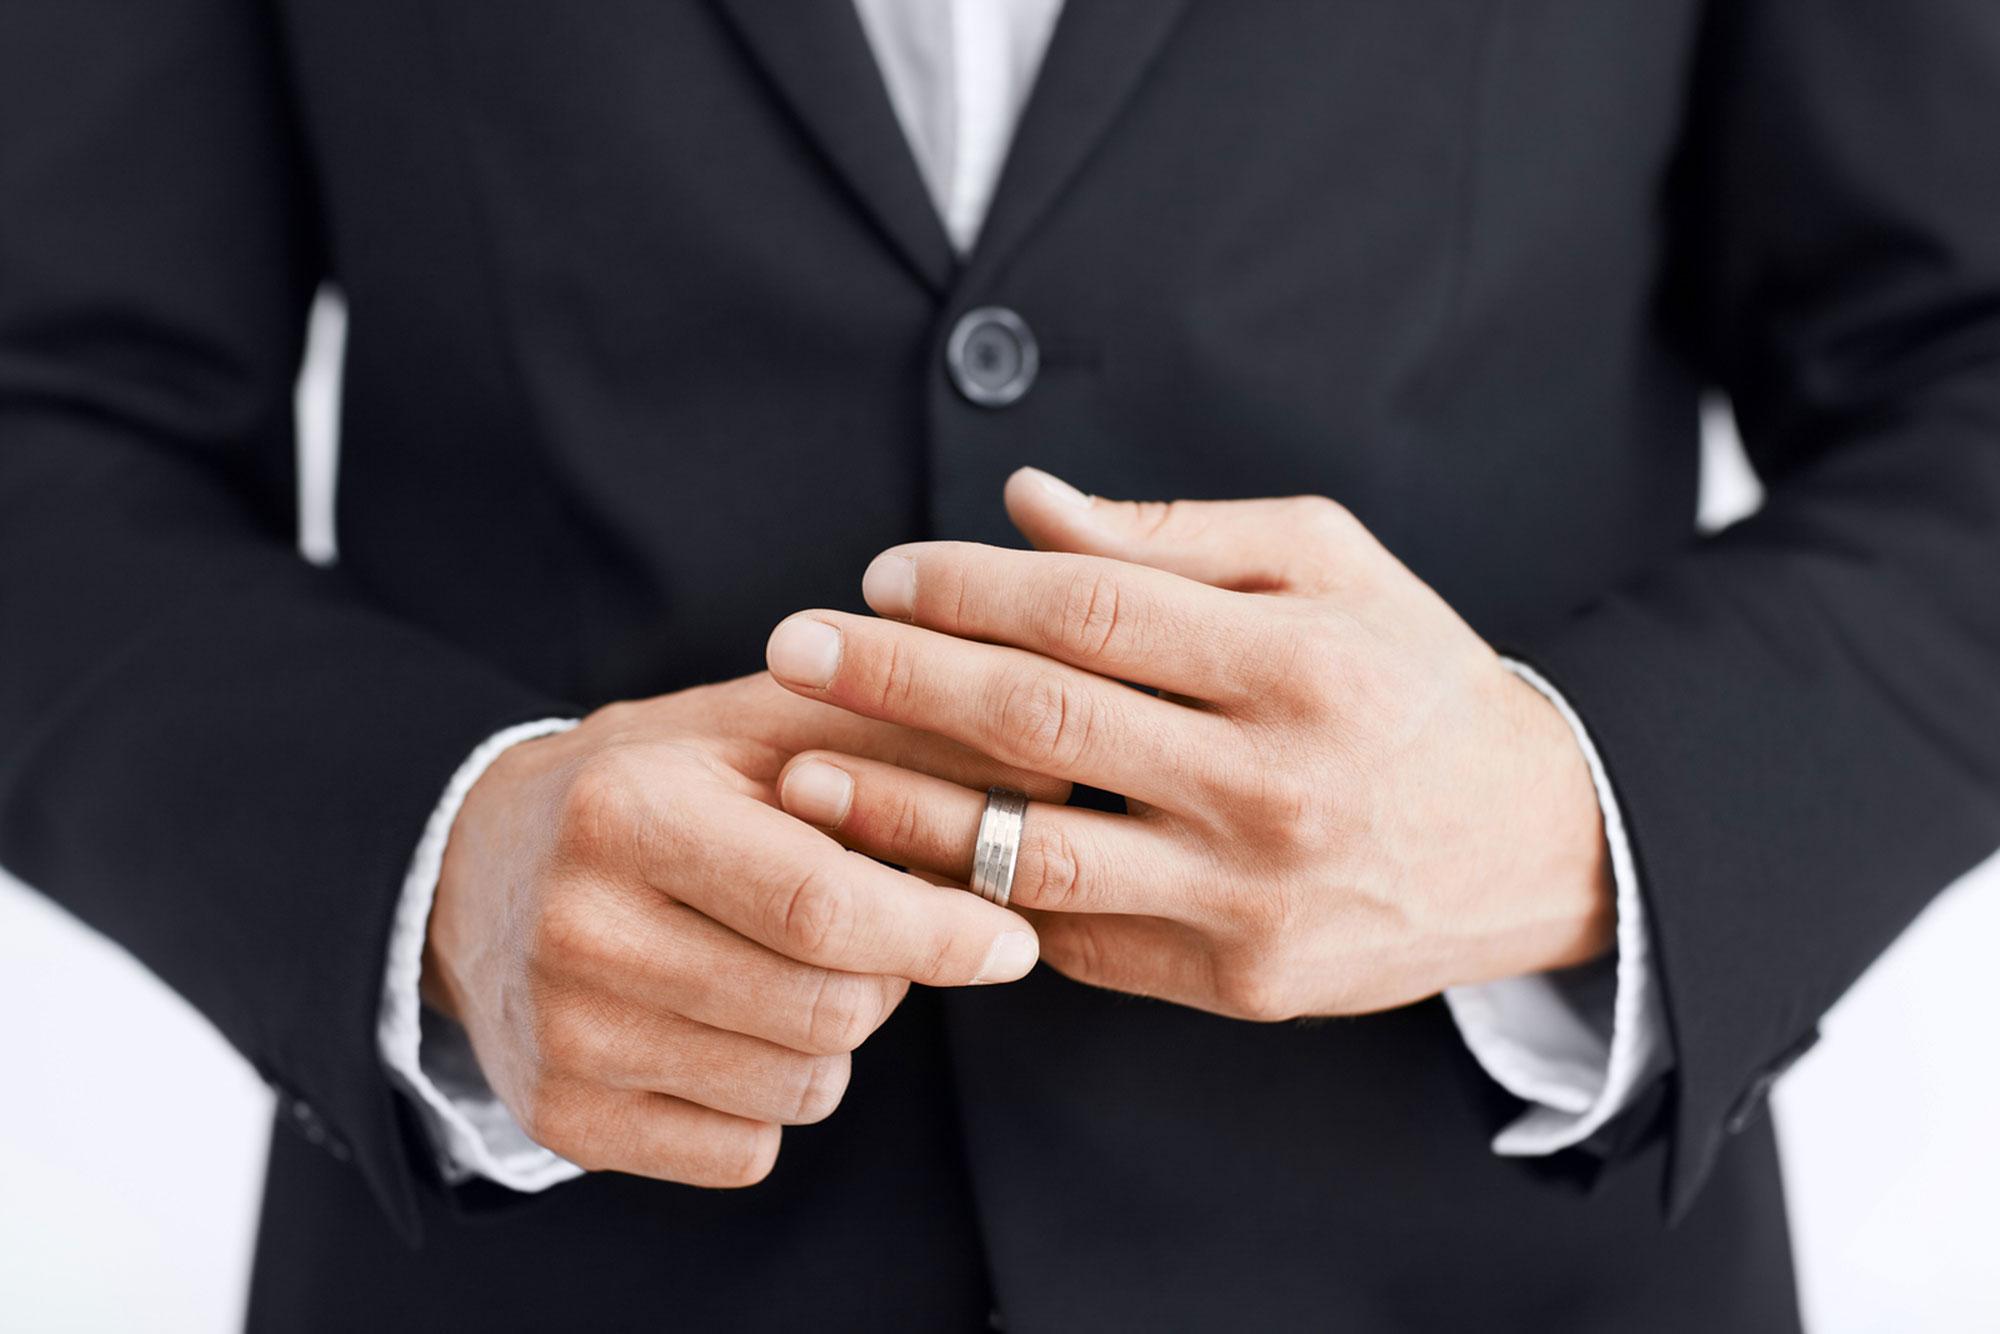 Картинки по запросу мужчина с кольцом